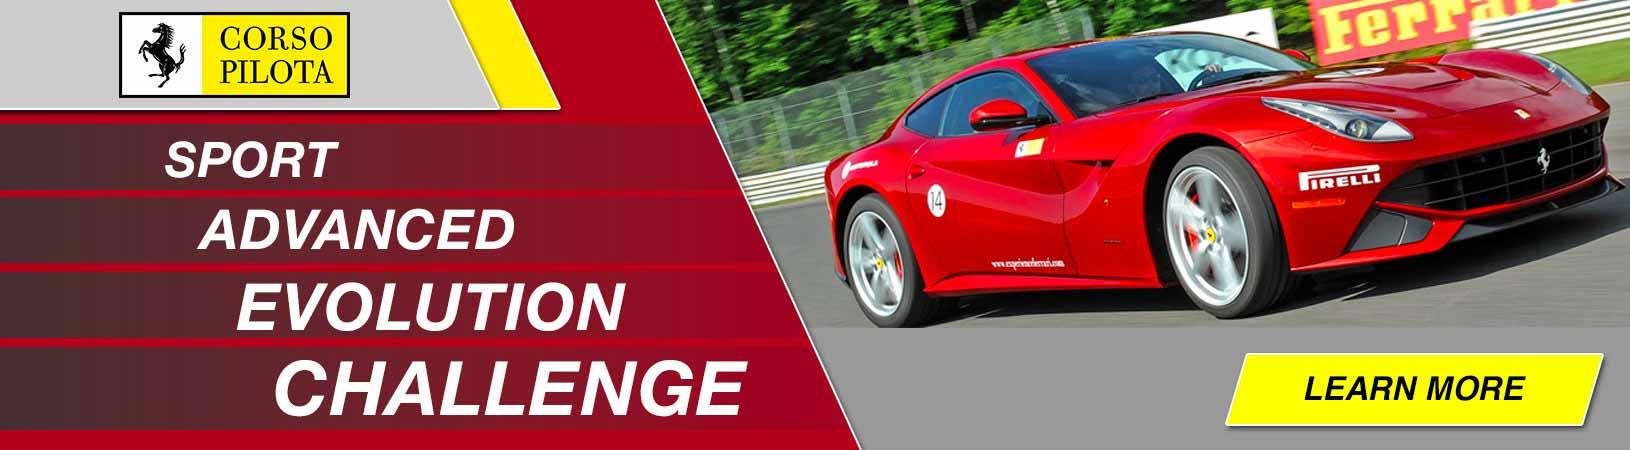 Ferrari Driving School New York >> Ferrari Corso Pilota